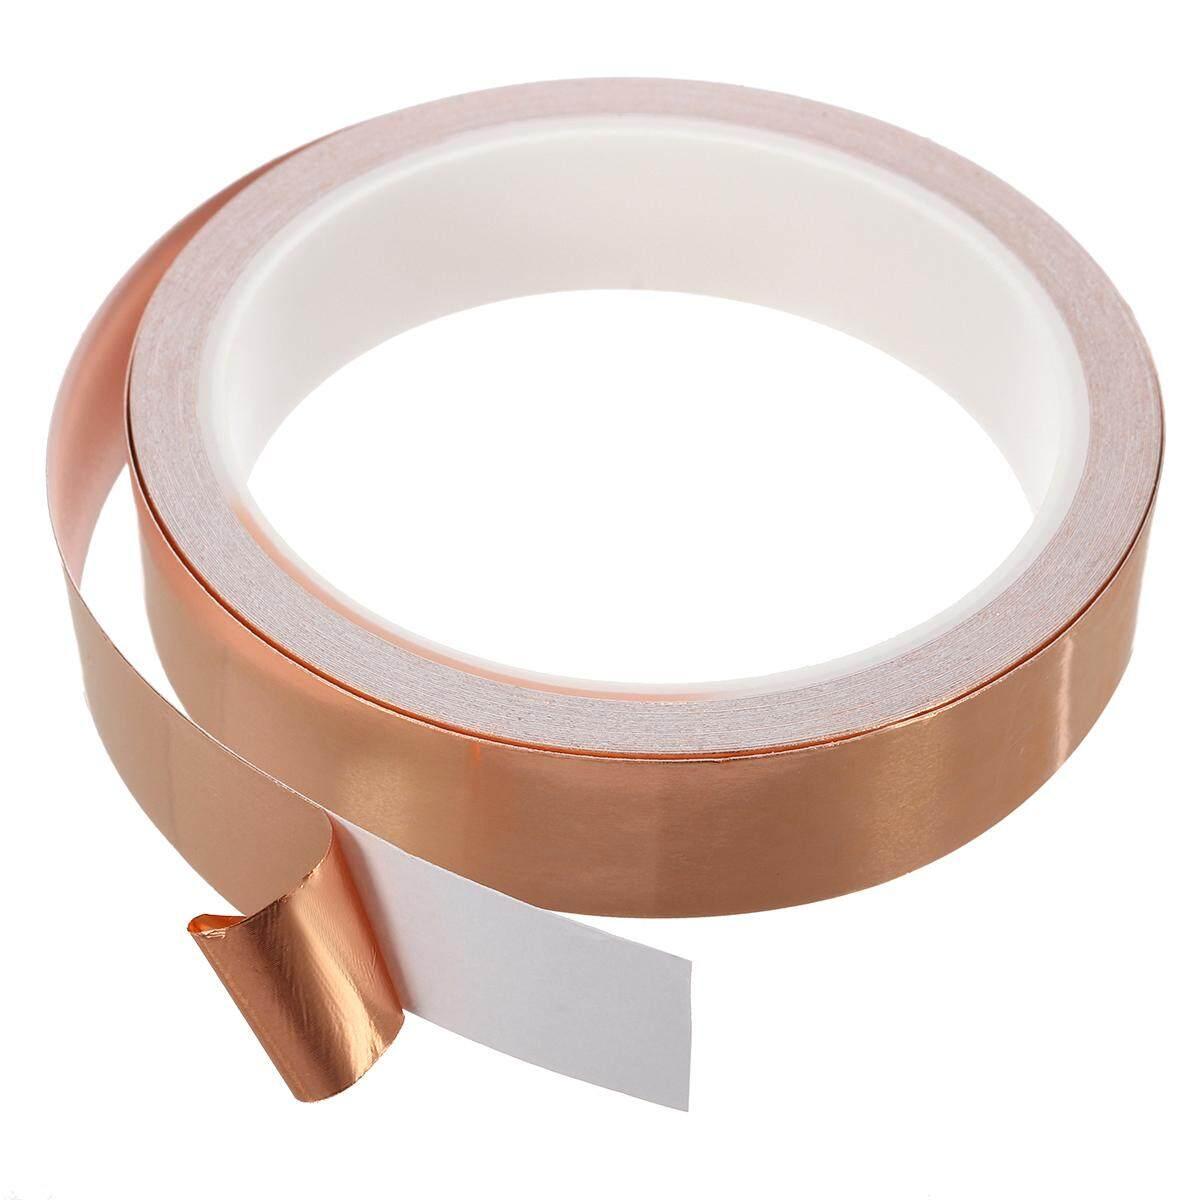 10m 20mm Single-sided Adhesive Conductive Copper Foil Tape Guitar Pickup EMI Shield